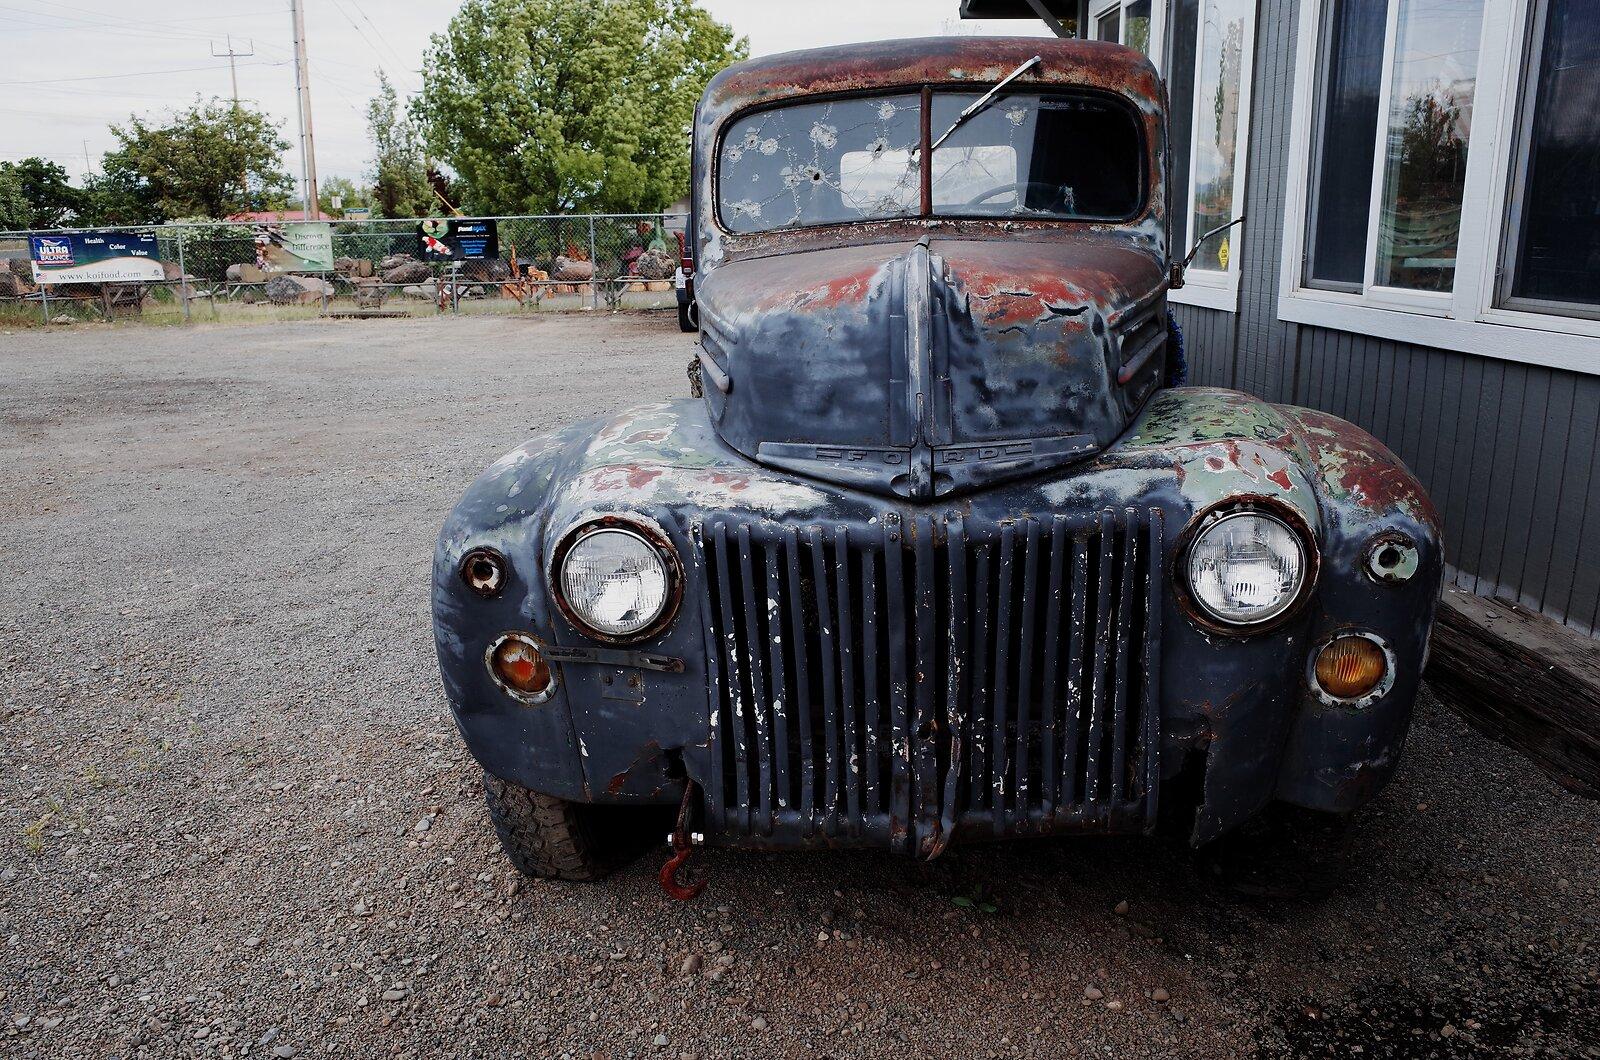 GRII_May5_Ancient_Ford_pickup#1.jpg